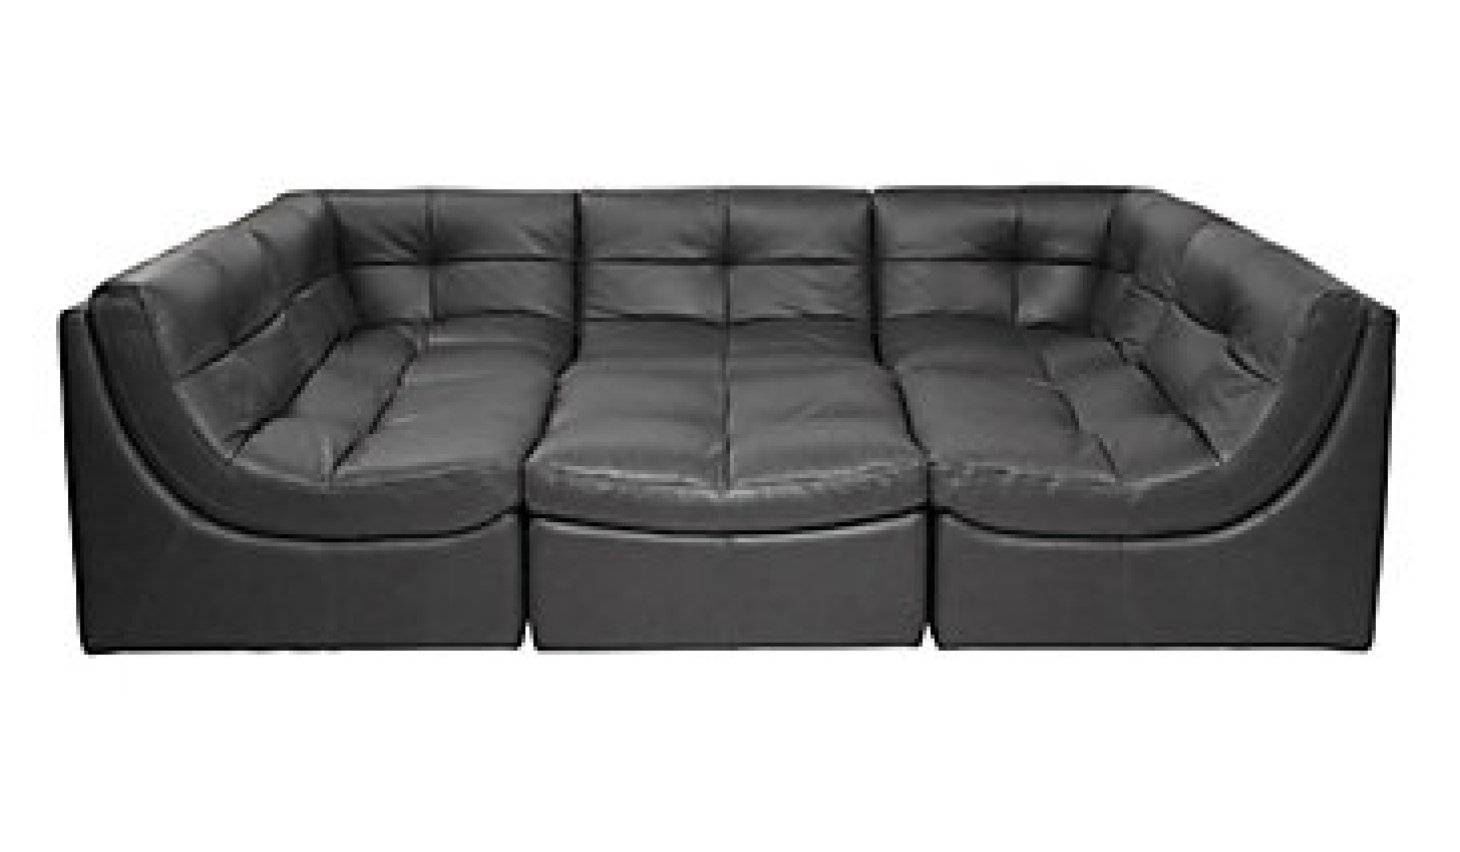 Sofa : Modular Sectional Sofa Fascinate Lexington Modern inside Cloud Sectional Sofas (Image 9 of 15)